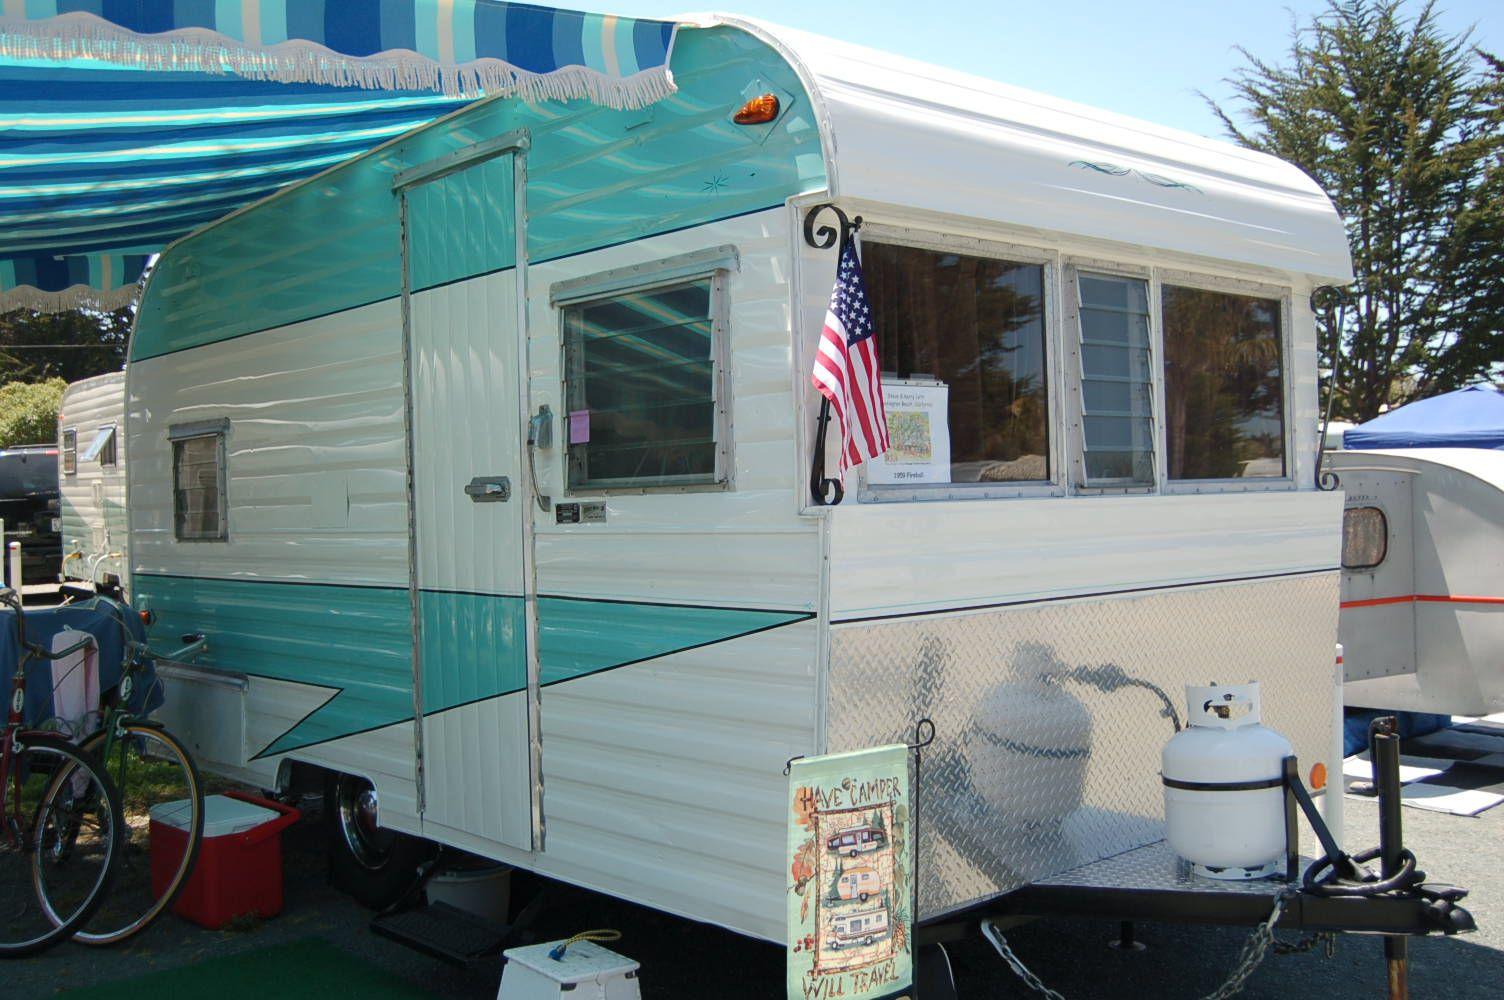 Vintage trailer love vintage camper dreams pinterest vintage trailers camping trailers and vintage caravans